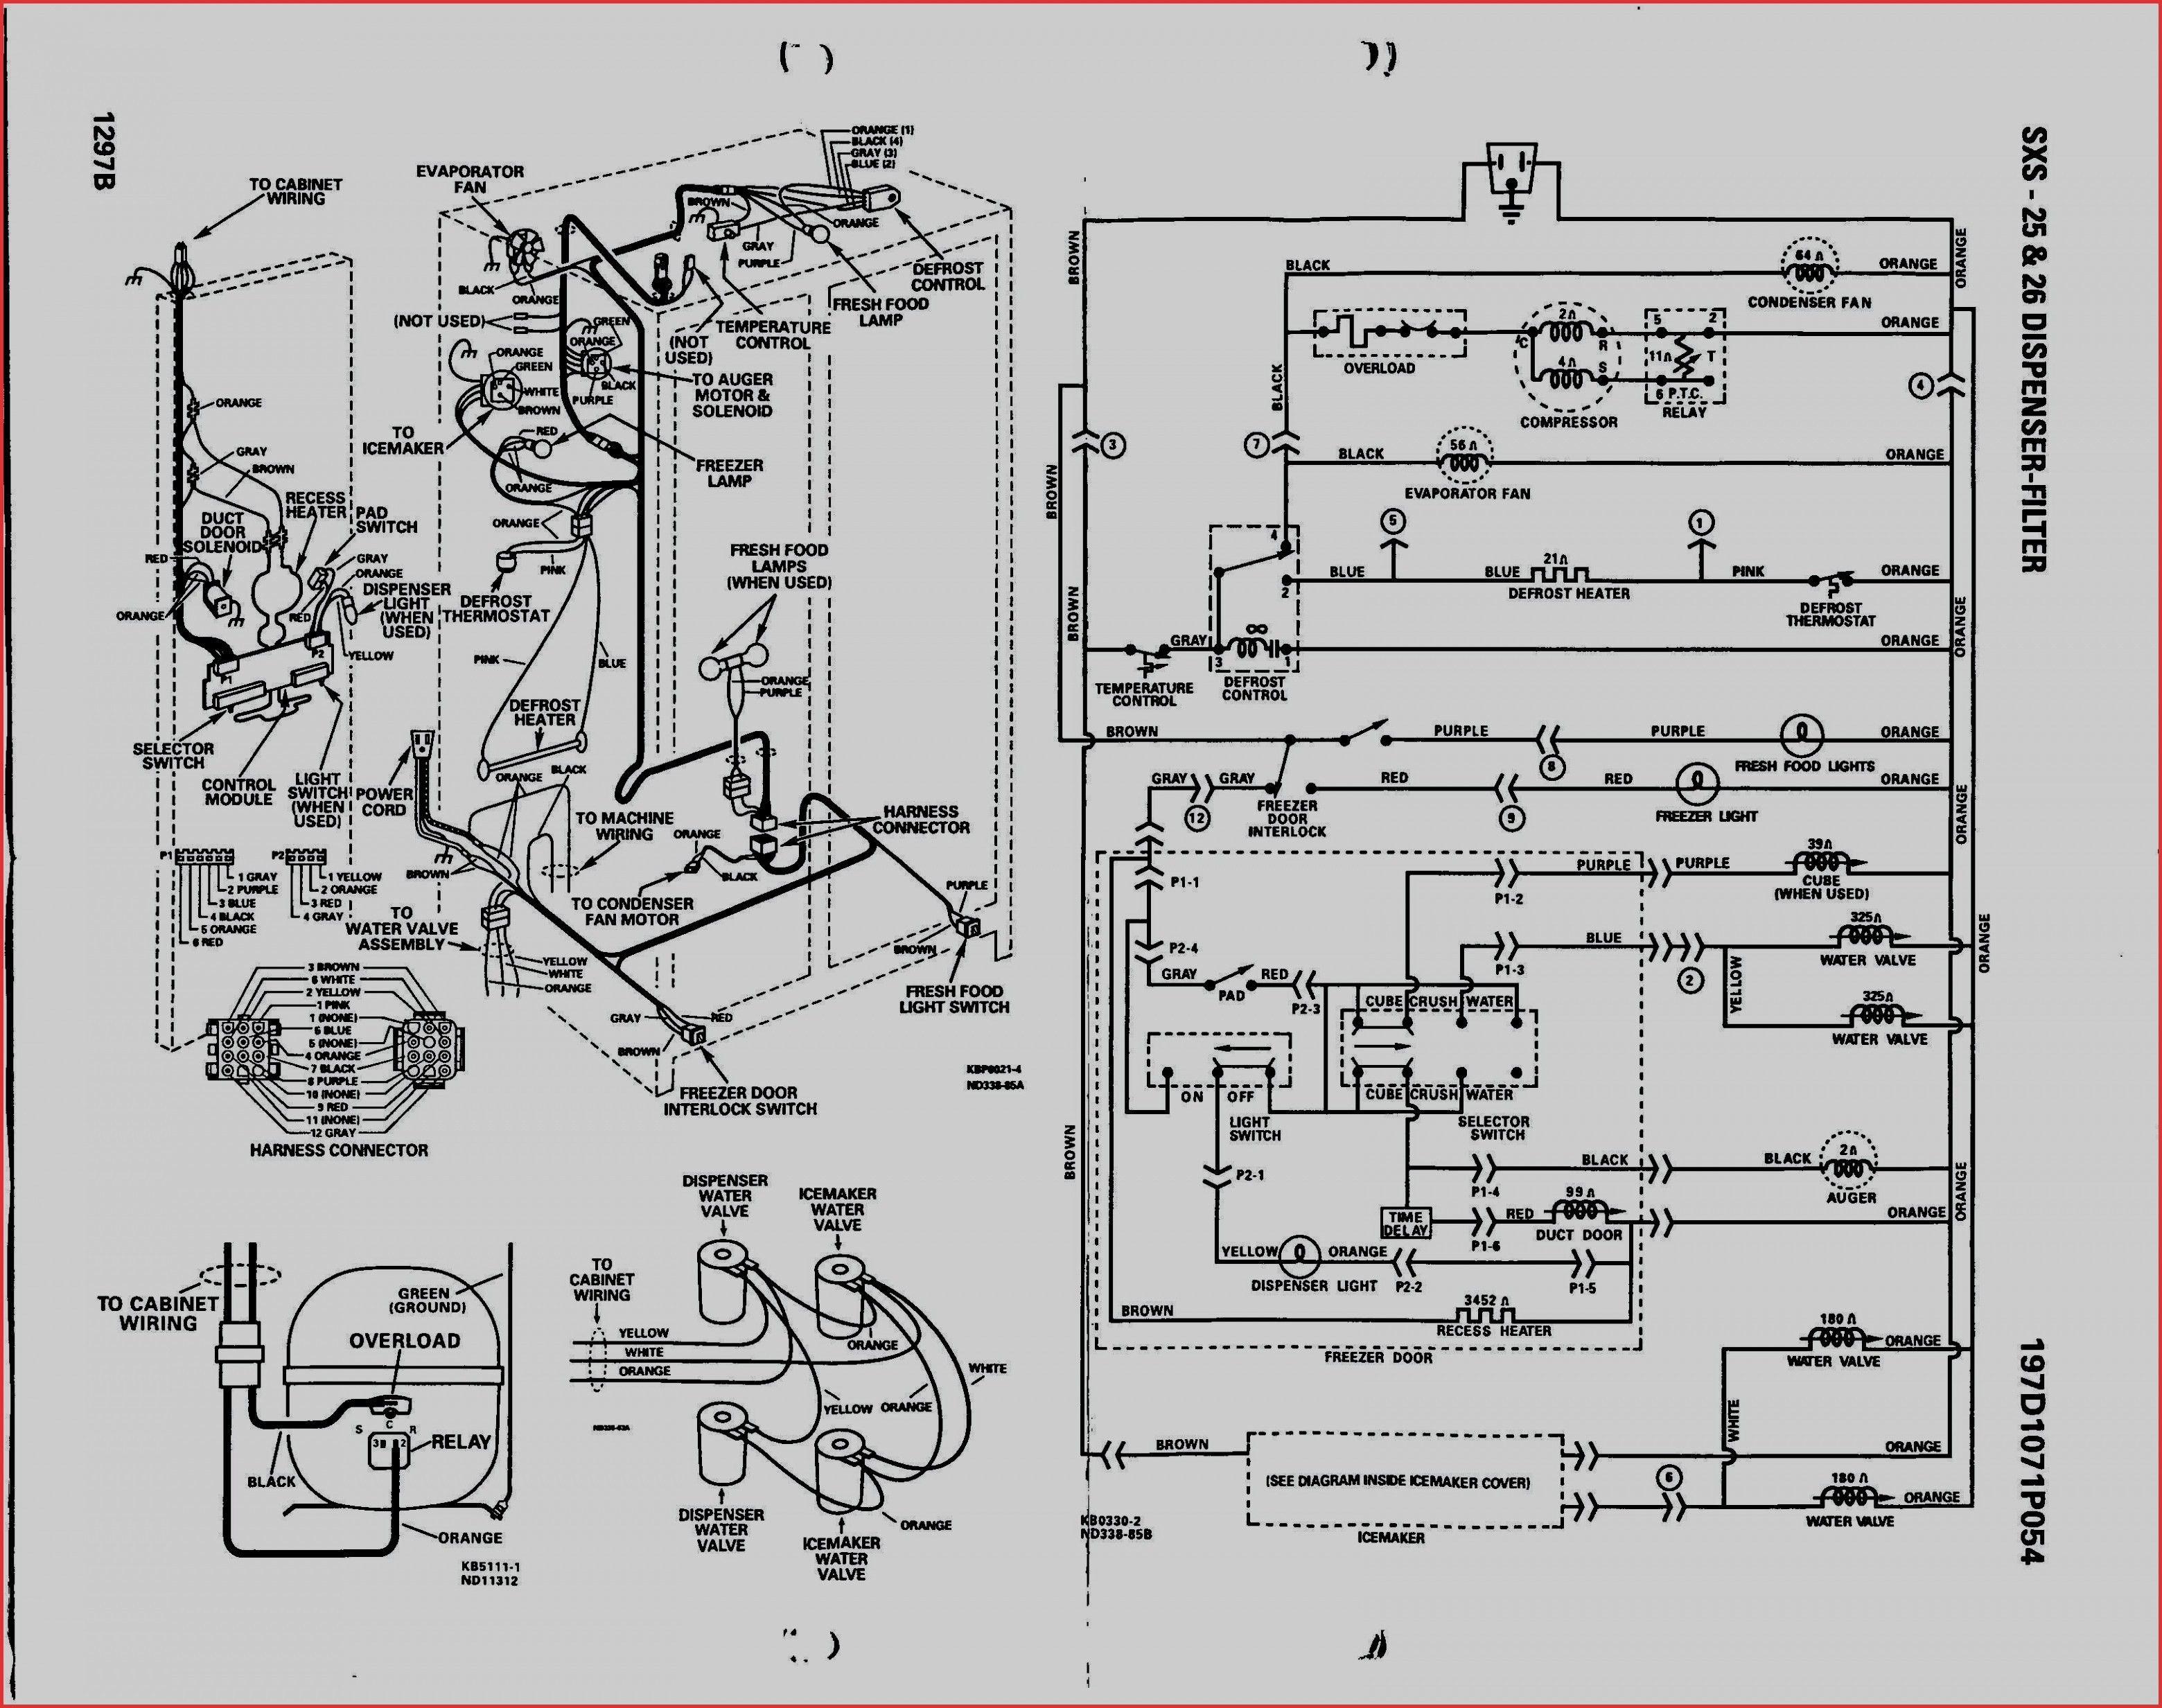 New W124 Ac Wiring Diagram Washing Machine And Dryer House Wiring Automatic Washing Machine